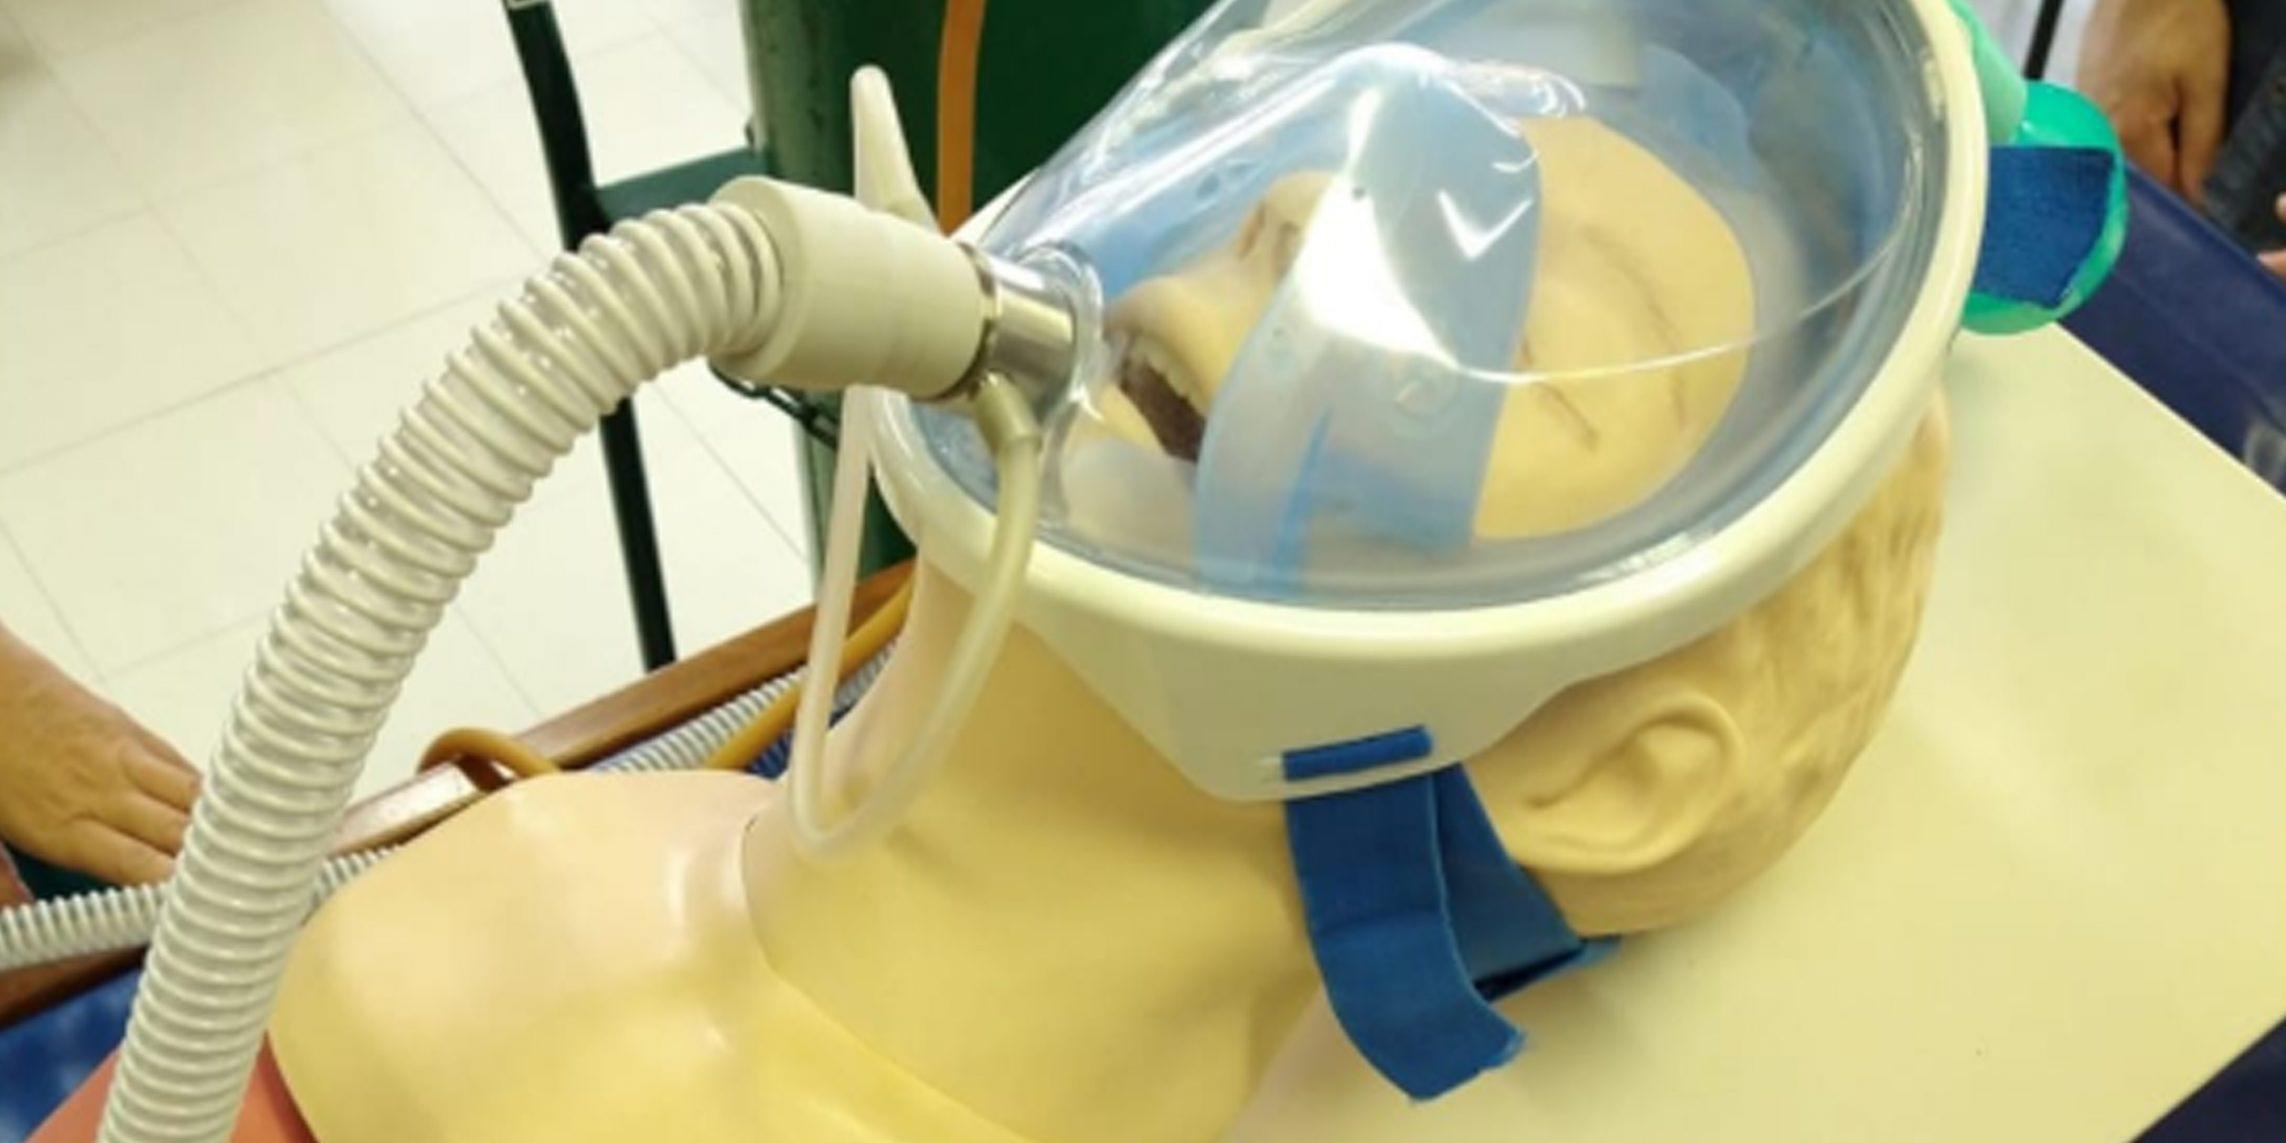 Santa Casa de Uruguaiana recebe máscaras que podem evitar uso de respiradores por intubação